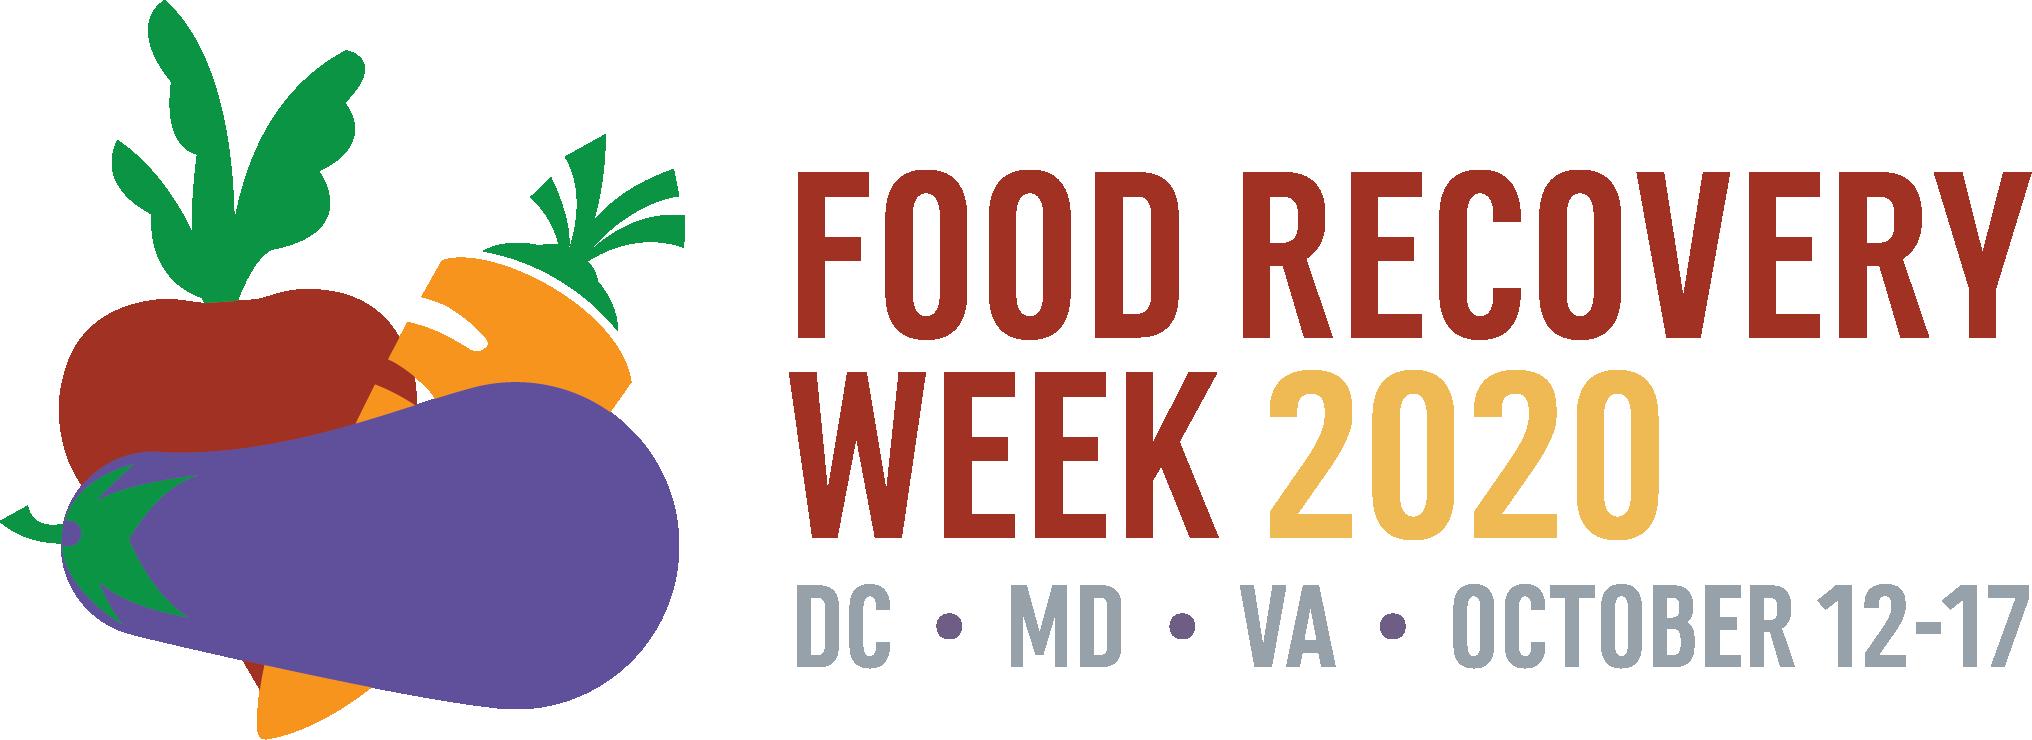 DMV Food Rescue Week 2020 banner